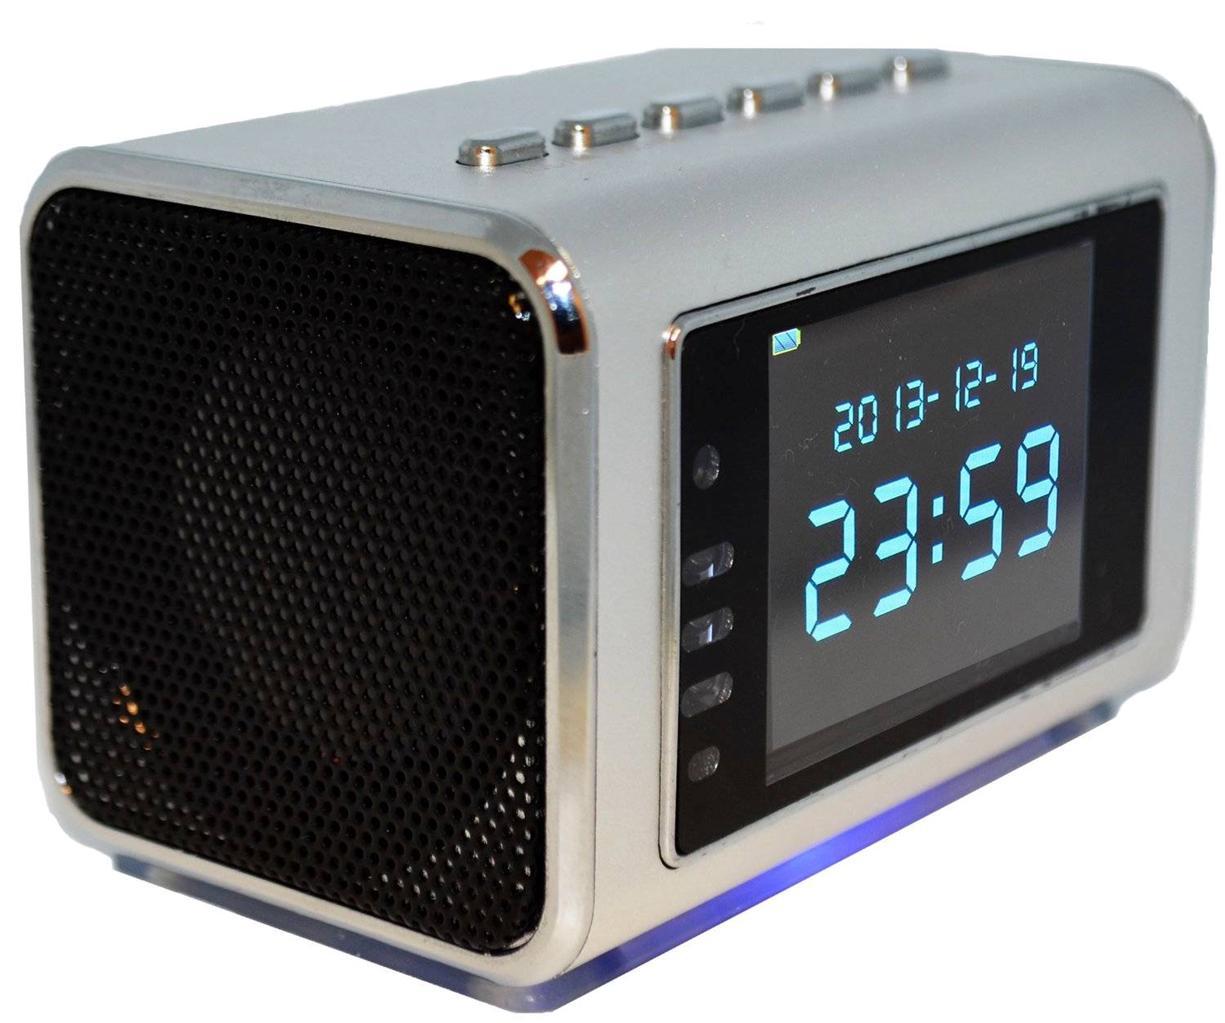 foscam fhc51 hidden spy clock radio video camera with dvr ebay. Black Bedroom Furniture Sets. Home Design Ideas